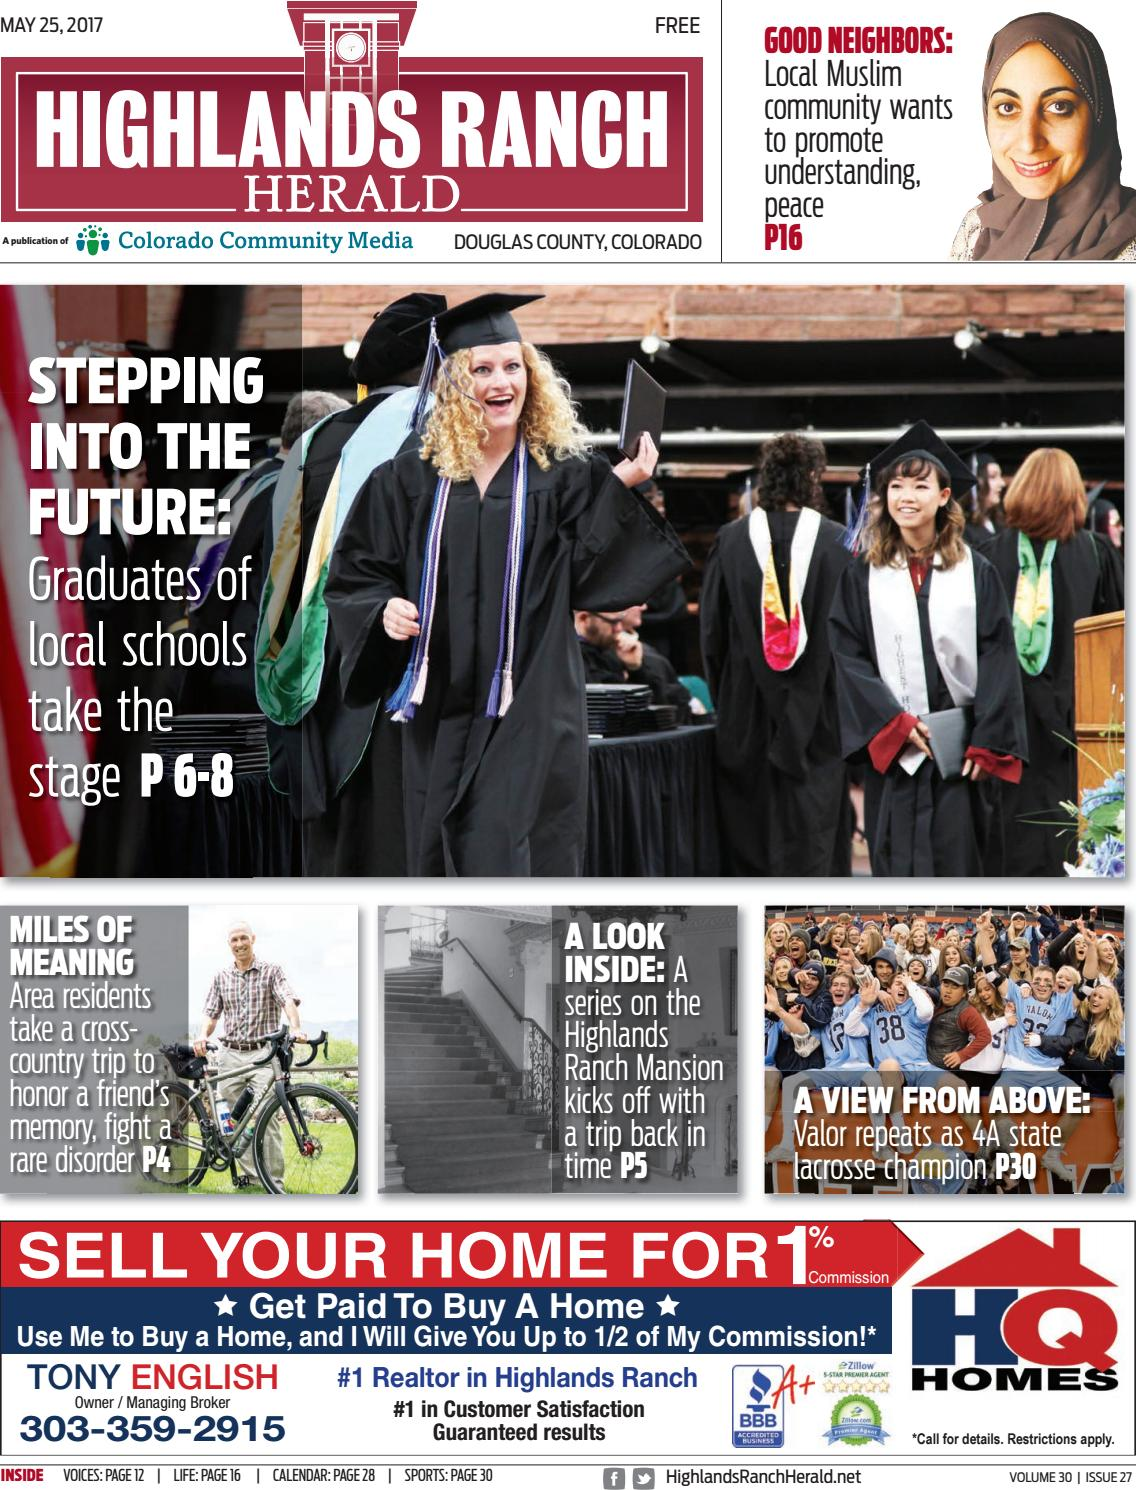 Highlands Ranch Herald 0525 by Colorado Community Media - issuu